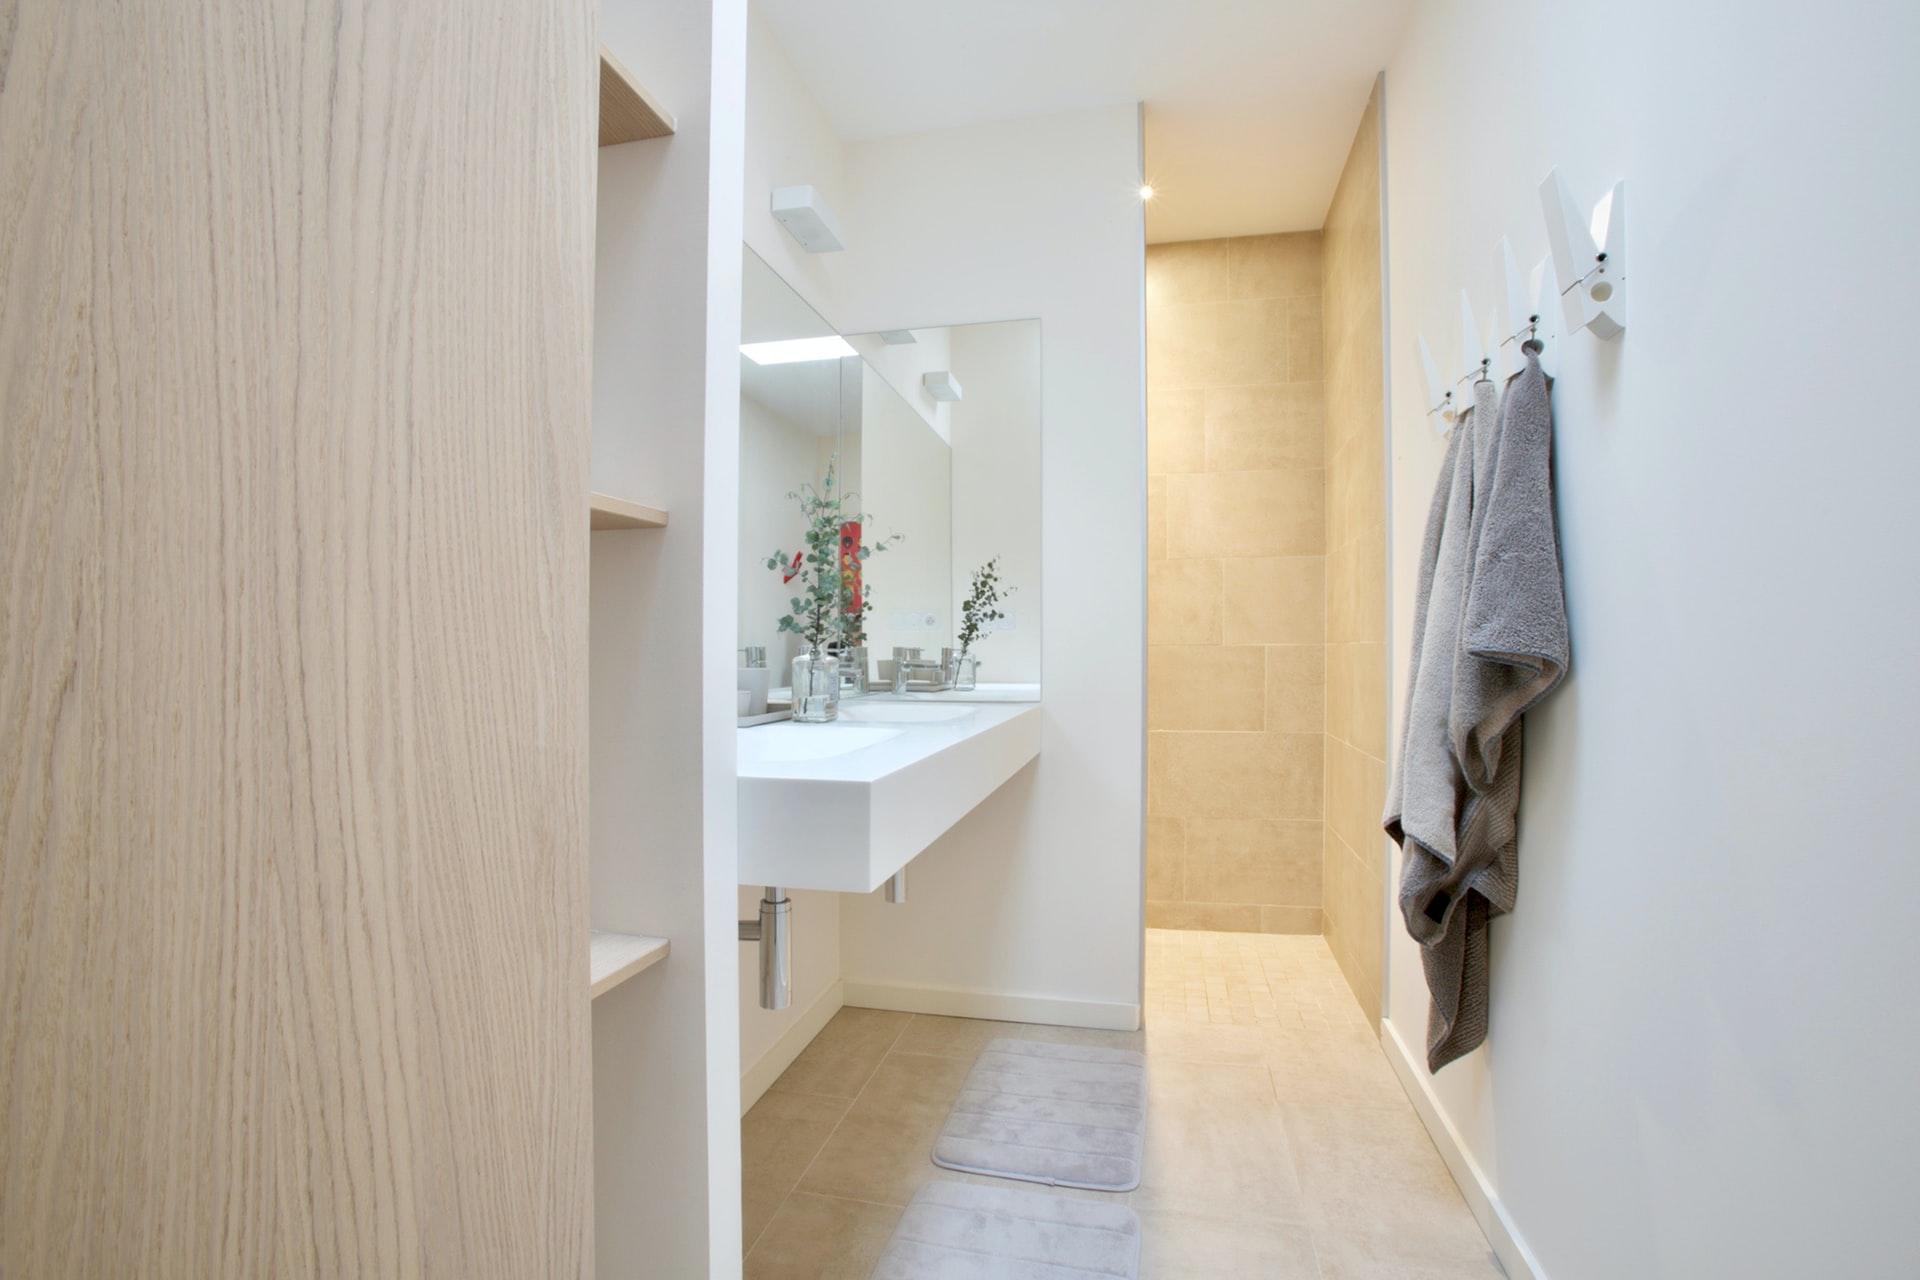 HMO Property Designs